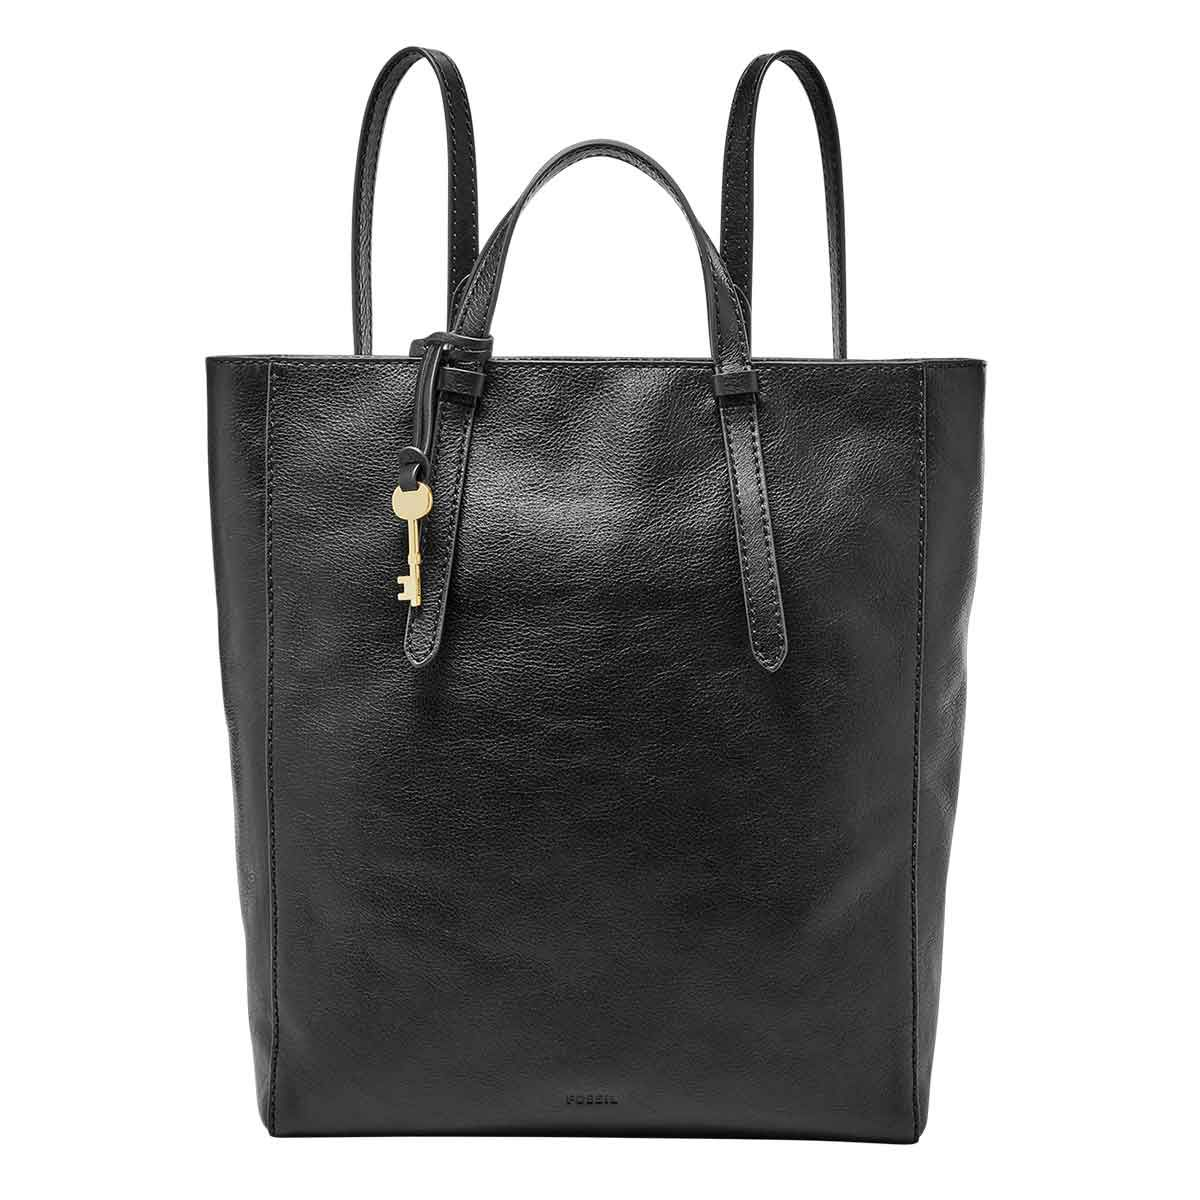 efb9251700d3cd Fossil Handbags & Purses - Macy's